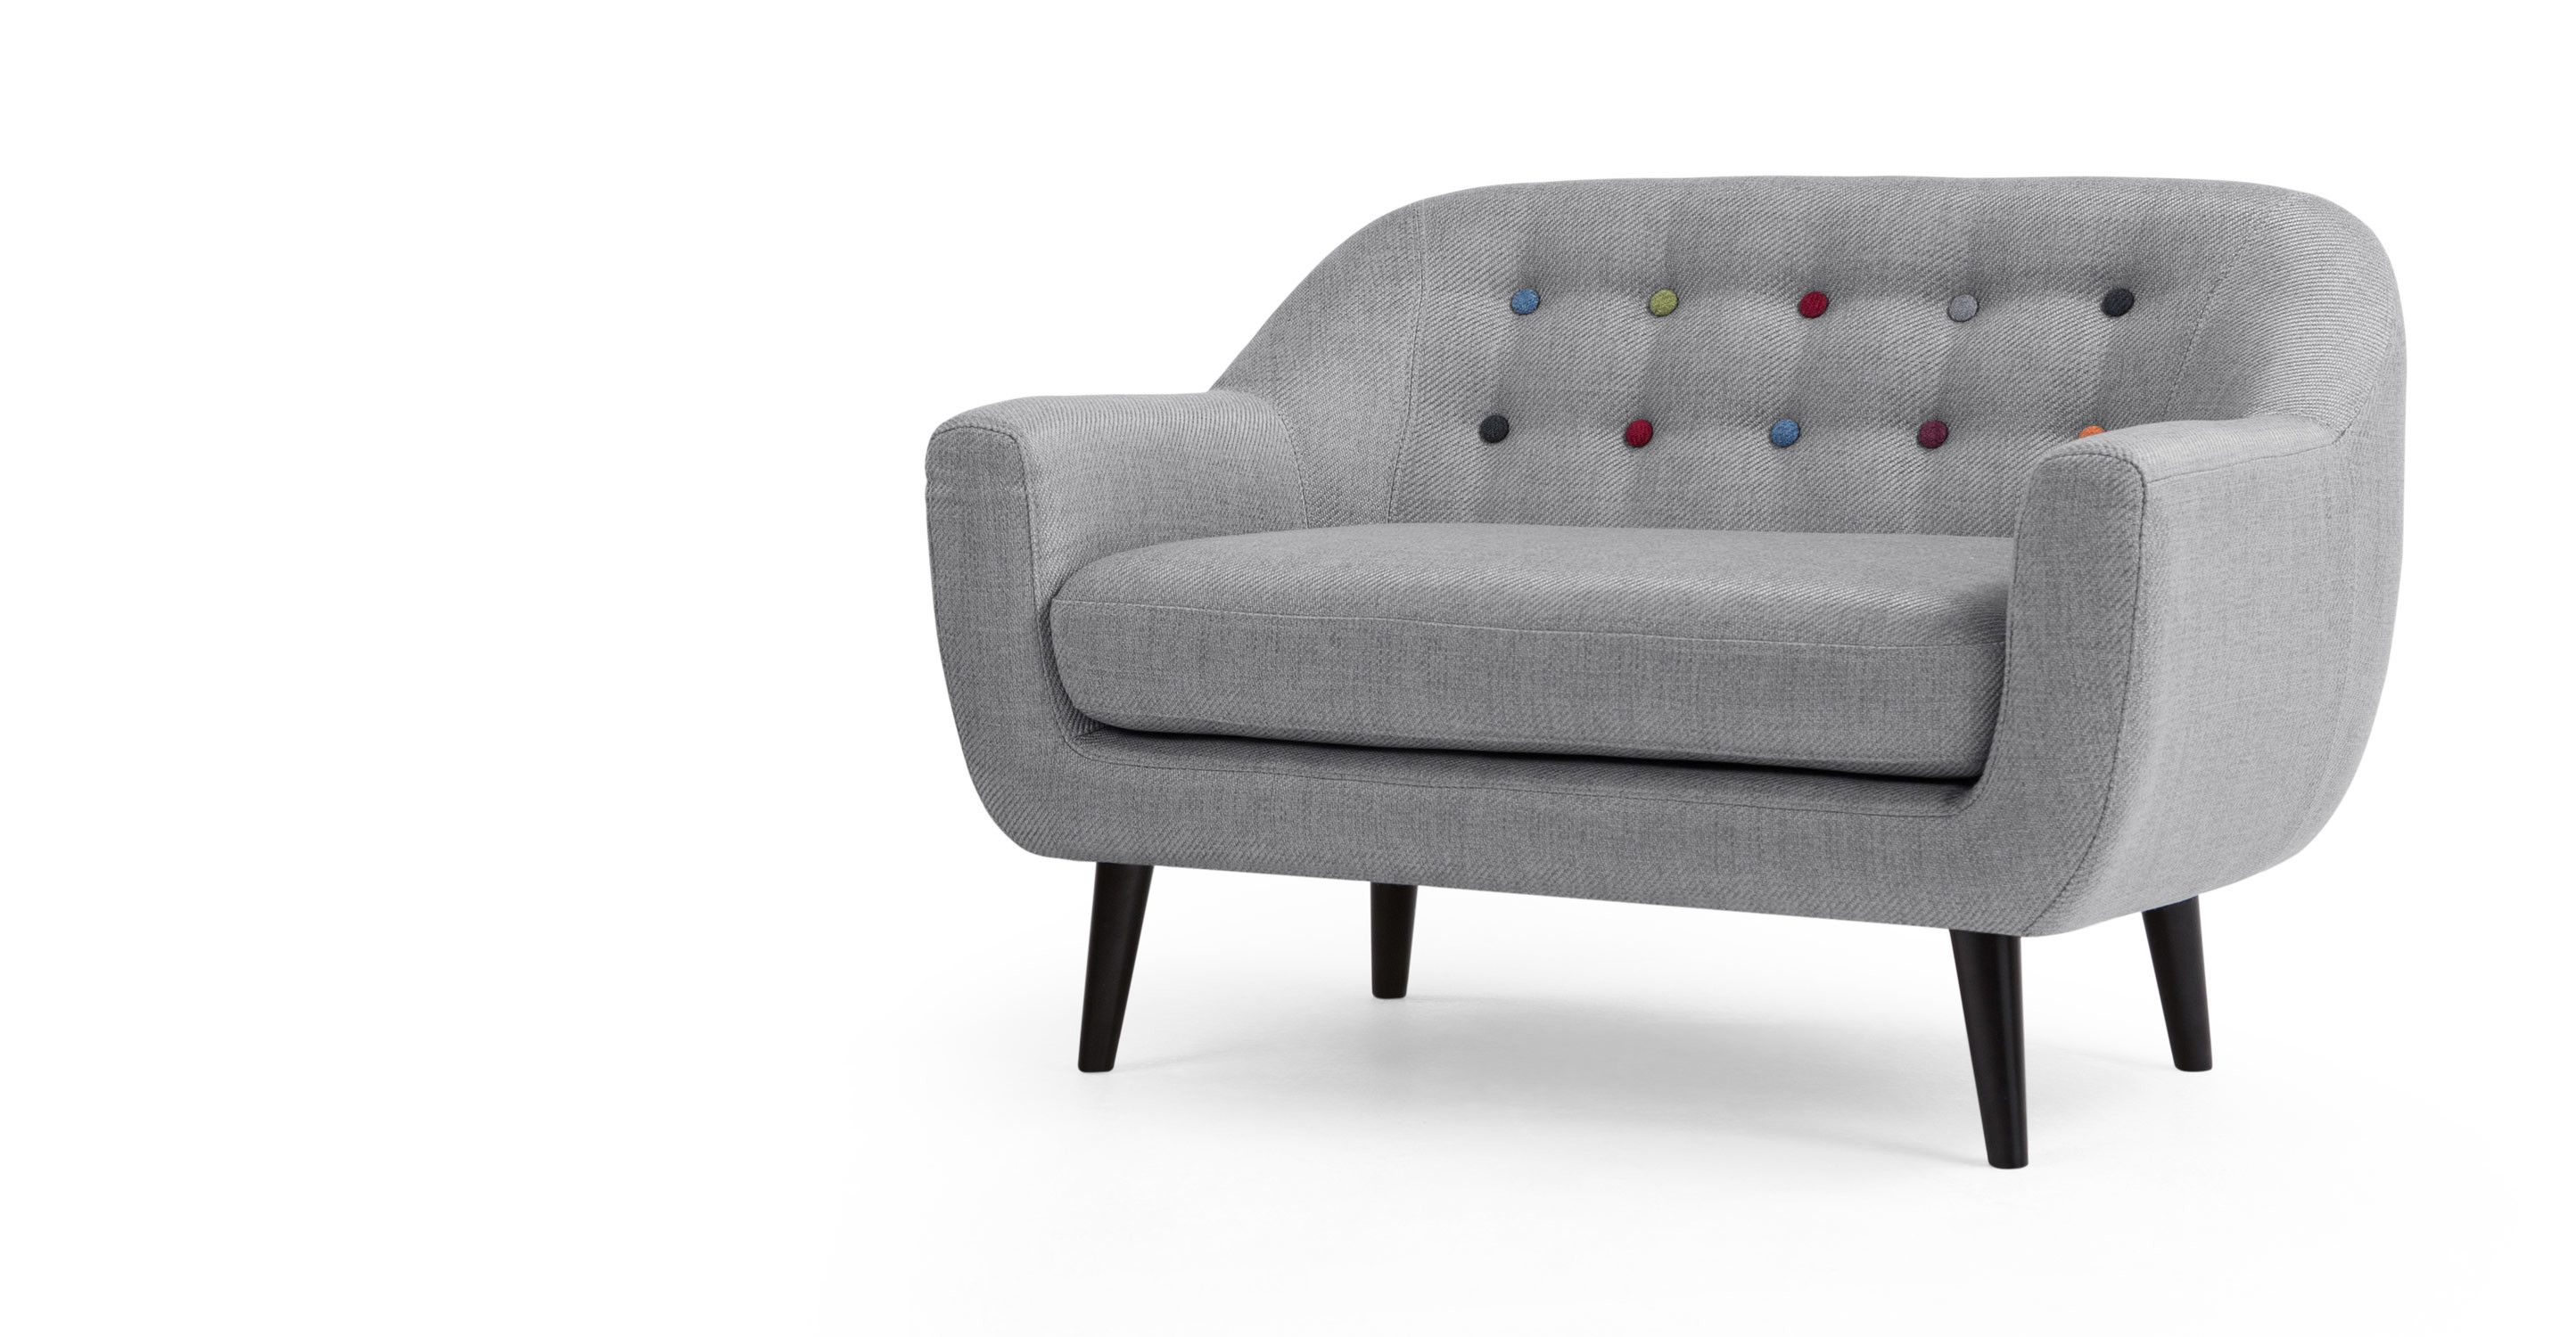 Mini Ritchie 2 Seater Sofa Pearl Grey With Rainbow Buttons Made Com Mini Sofa Seater Sofa 2 Seater Sofa